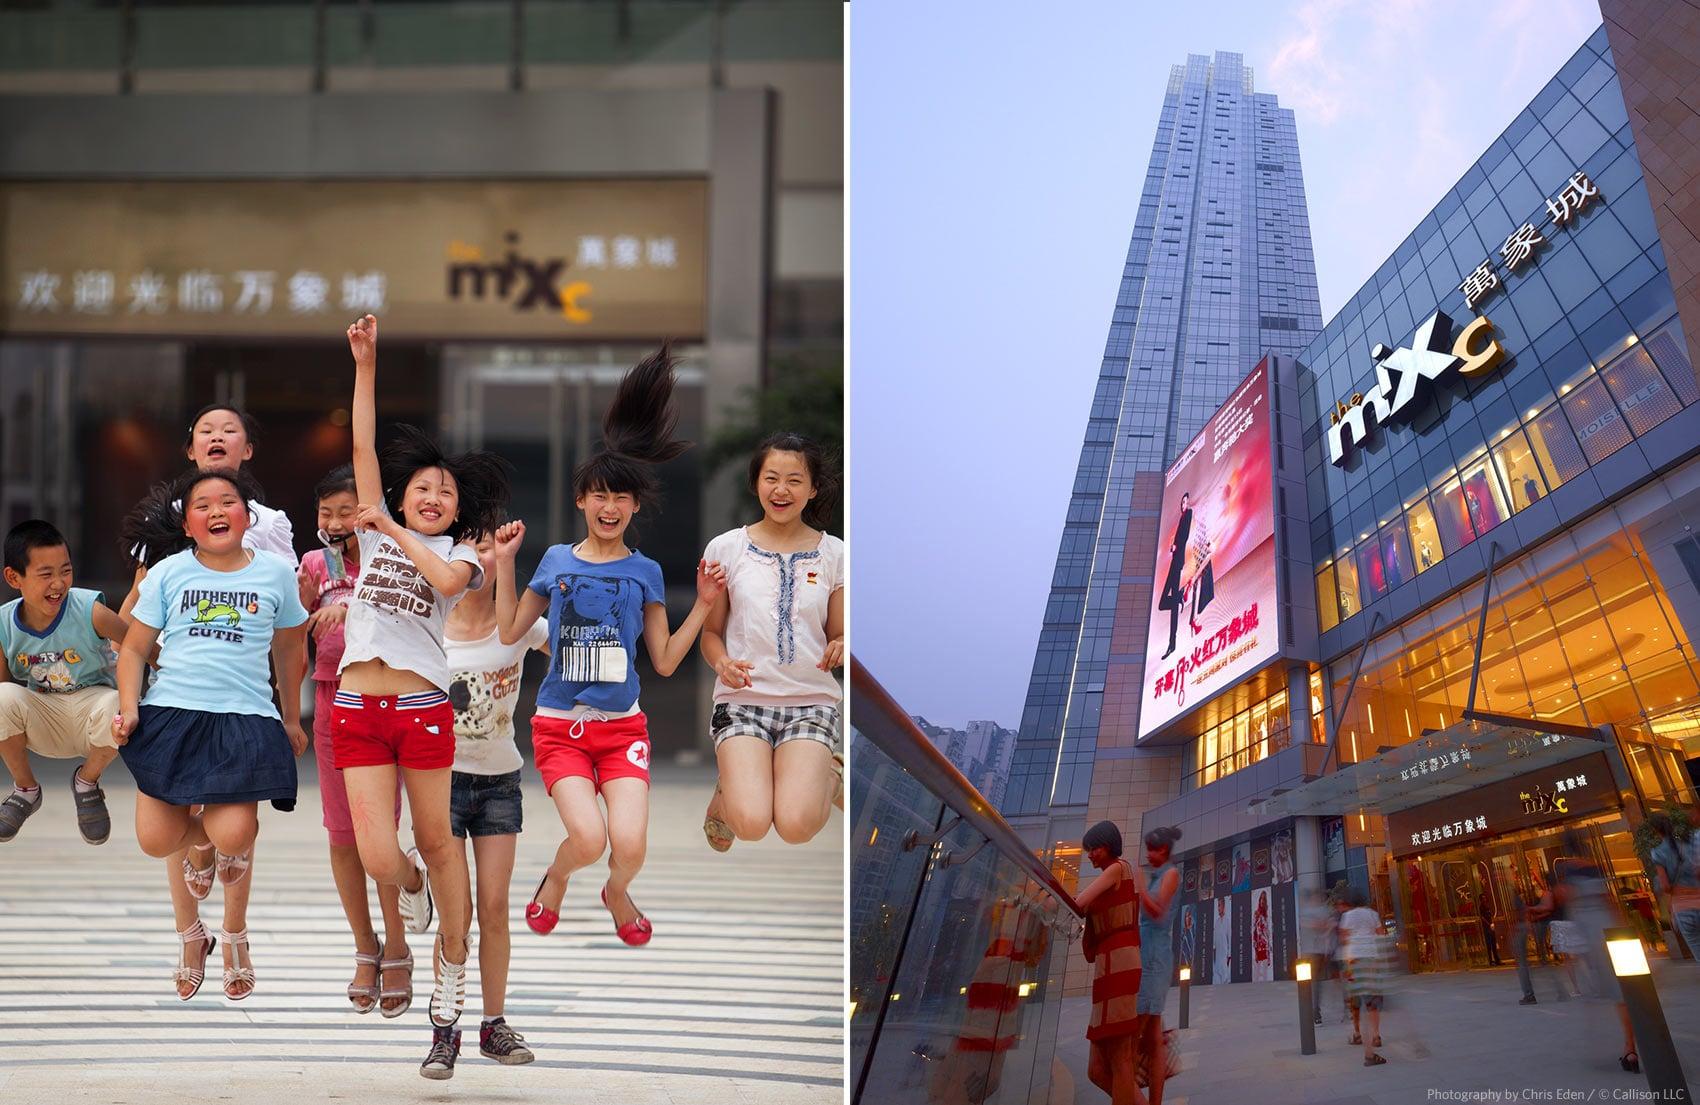 Mix C, Chengdu, China - Kids happy to be here - Entry at twilight